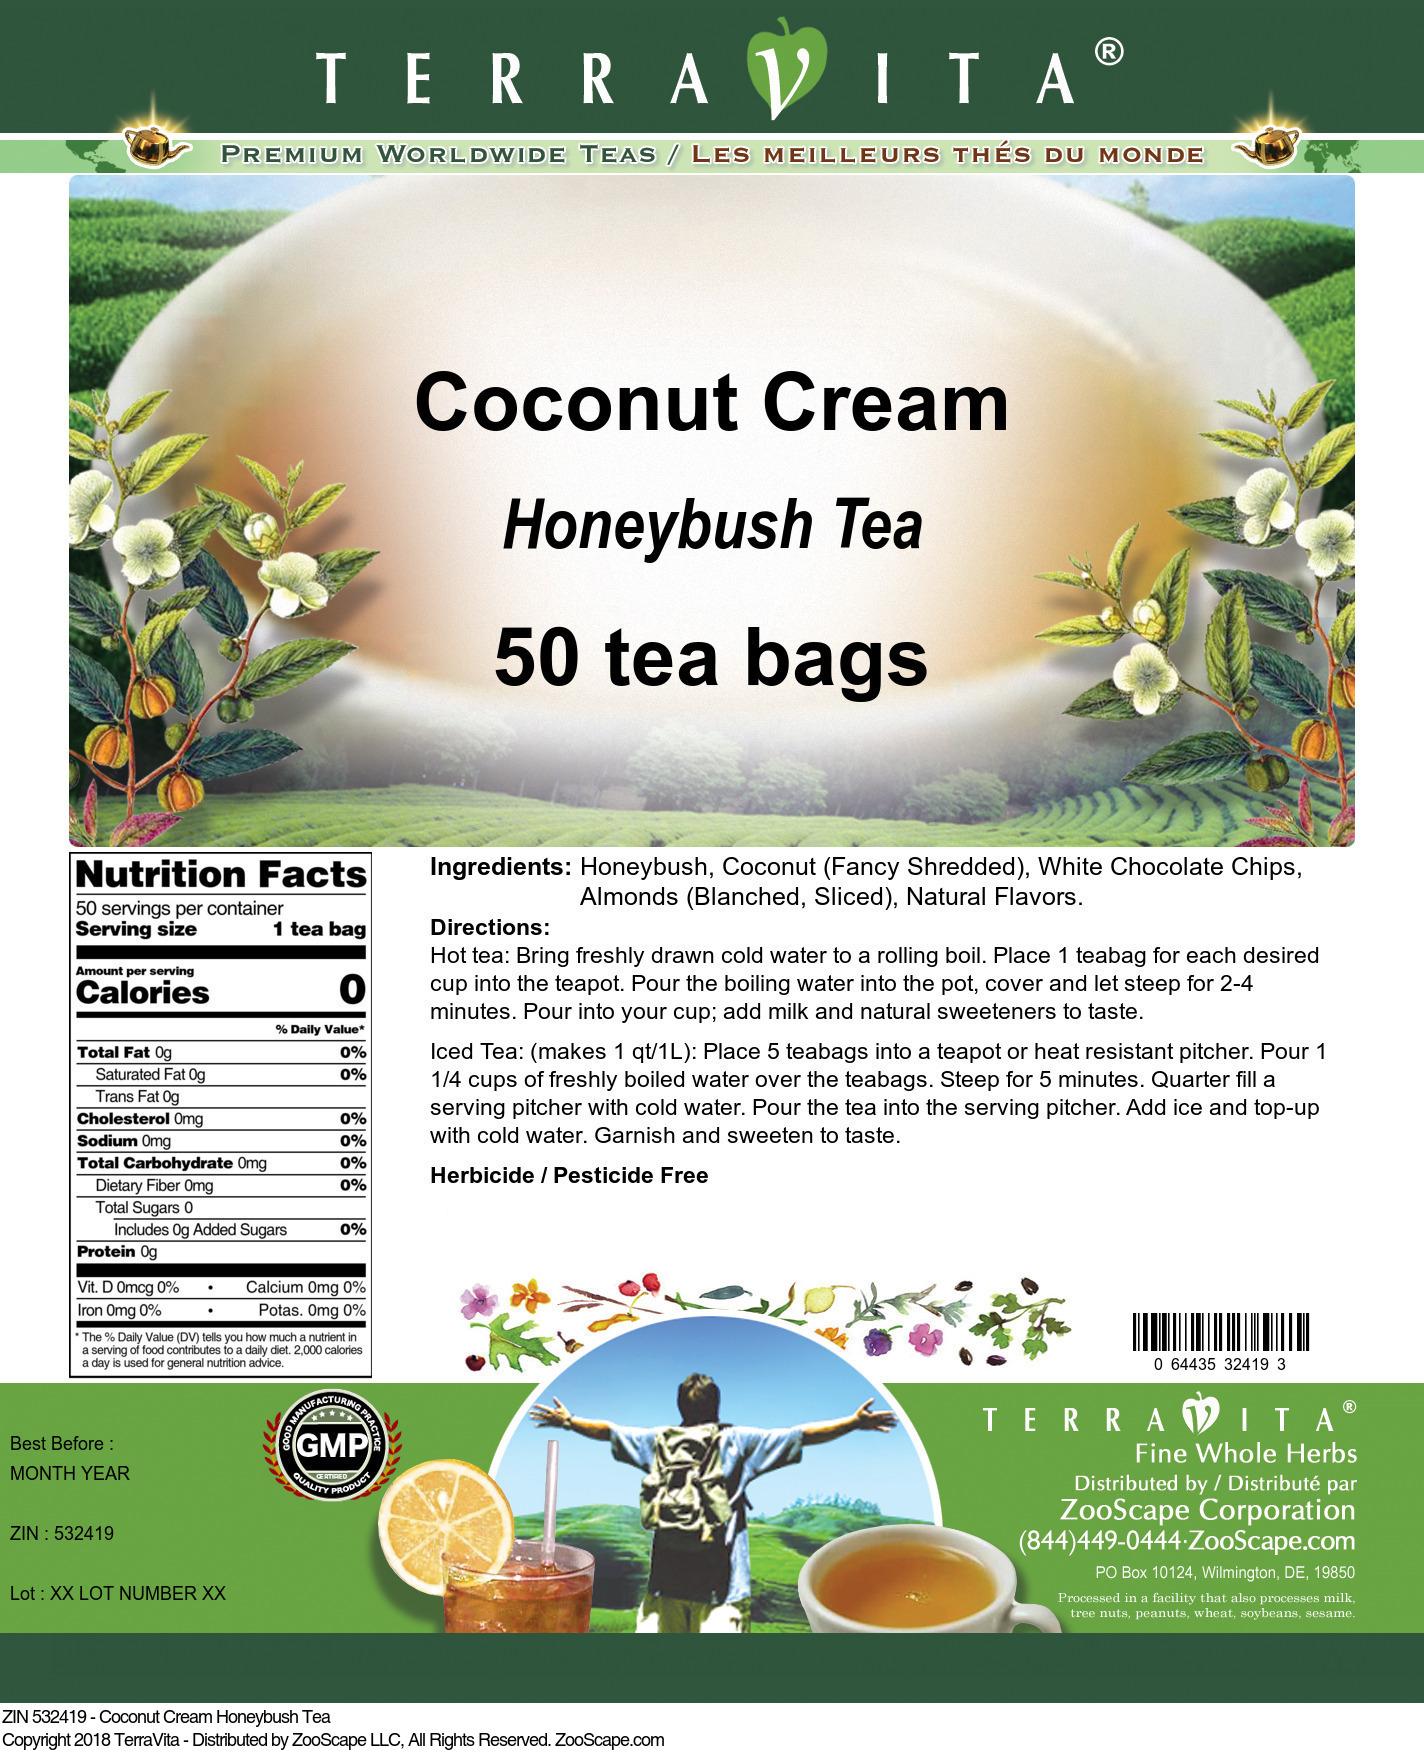 Coconut Cream Honeybush Tea